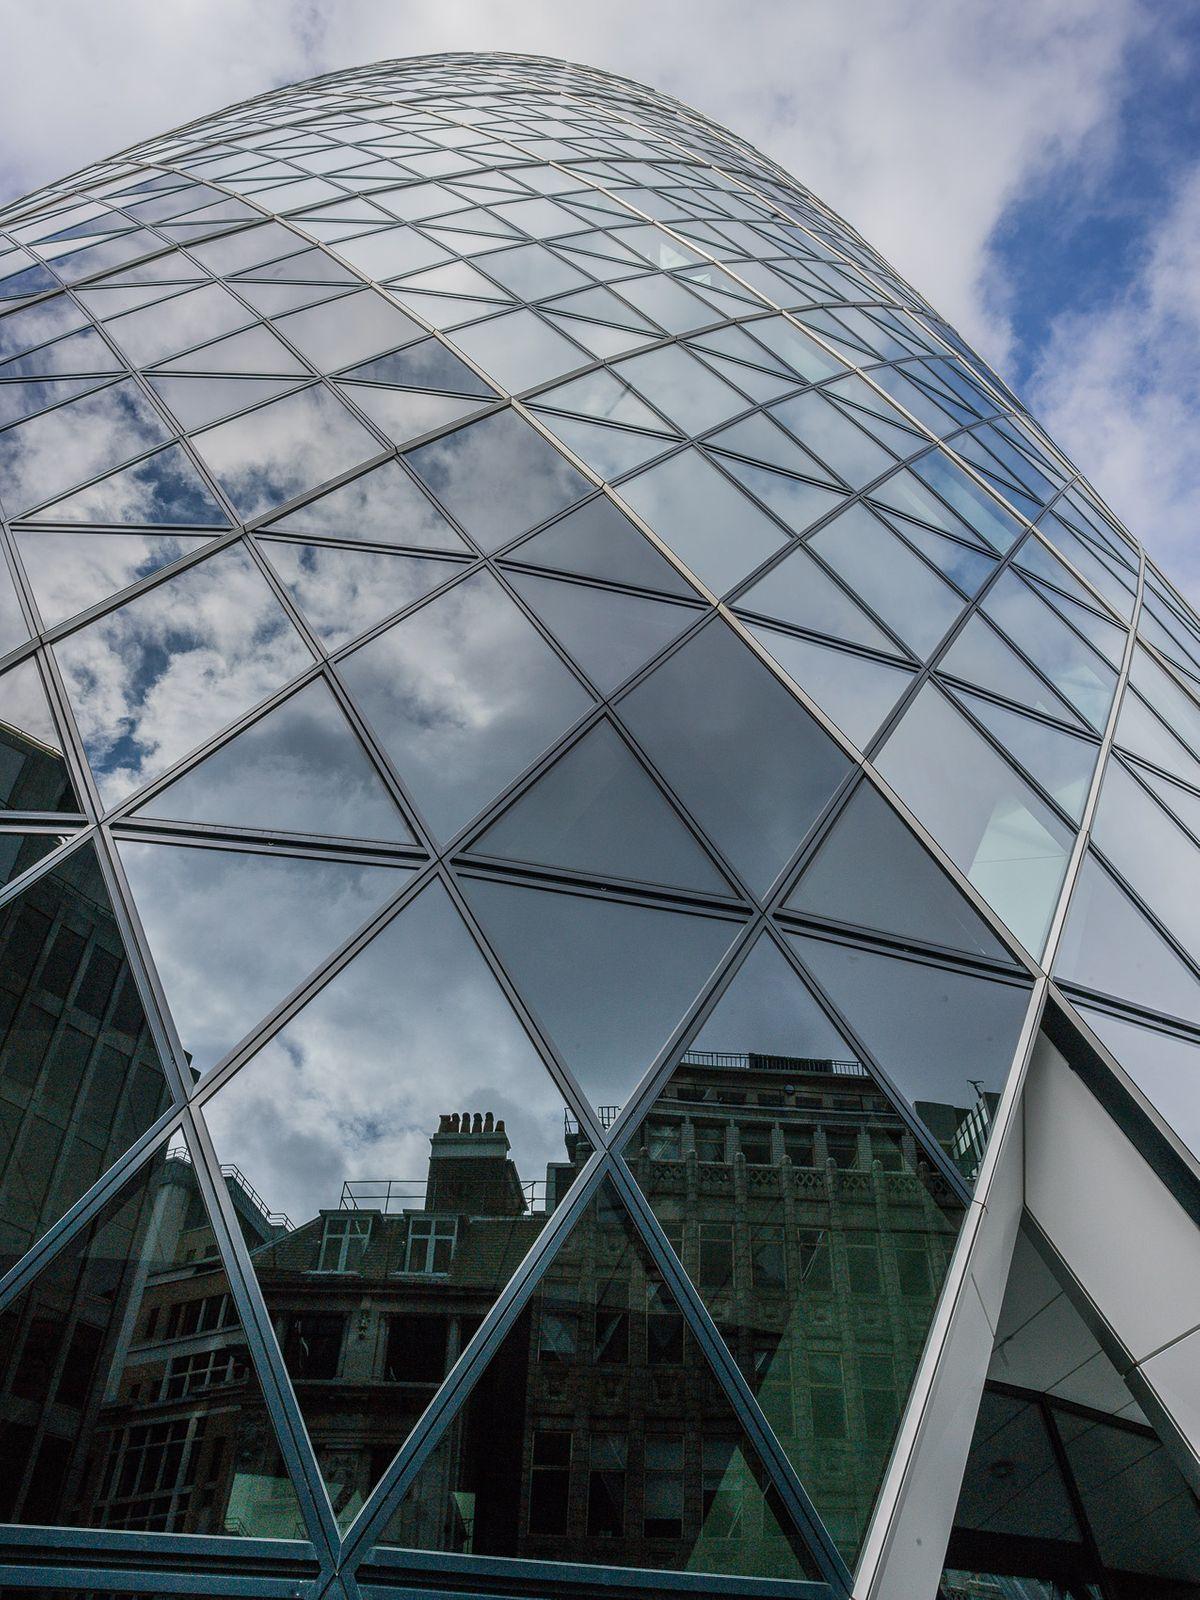 THE GHERKIN, NORMAN FOSTER   SWISS TOWER, STUDY 1, LONDON, ENGLAND, 2018